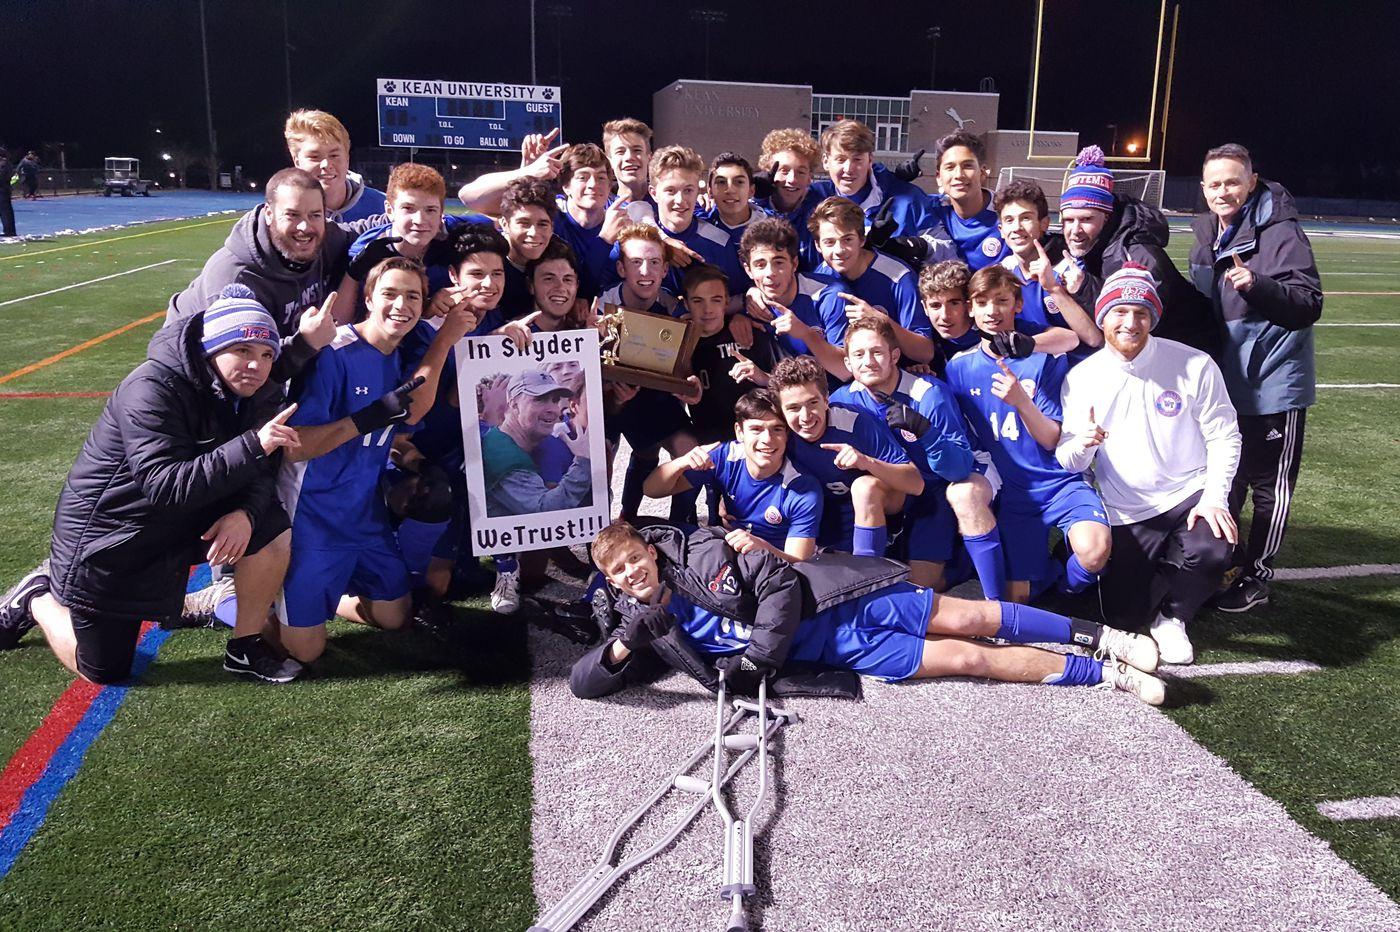 Justin Bautista scores winner as Washington Township takes Group 4 state soccer title